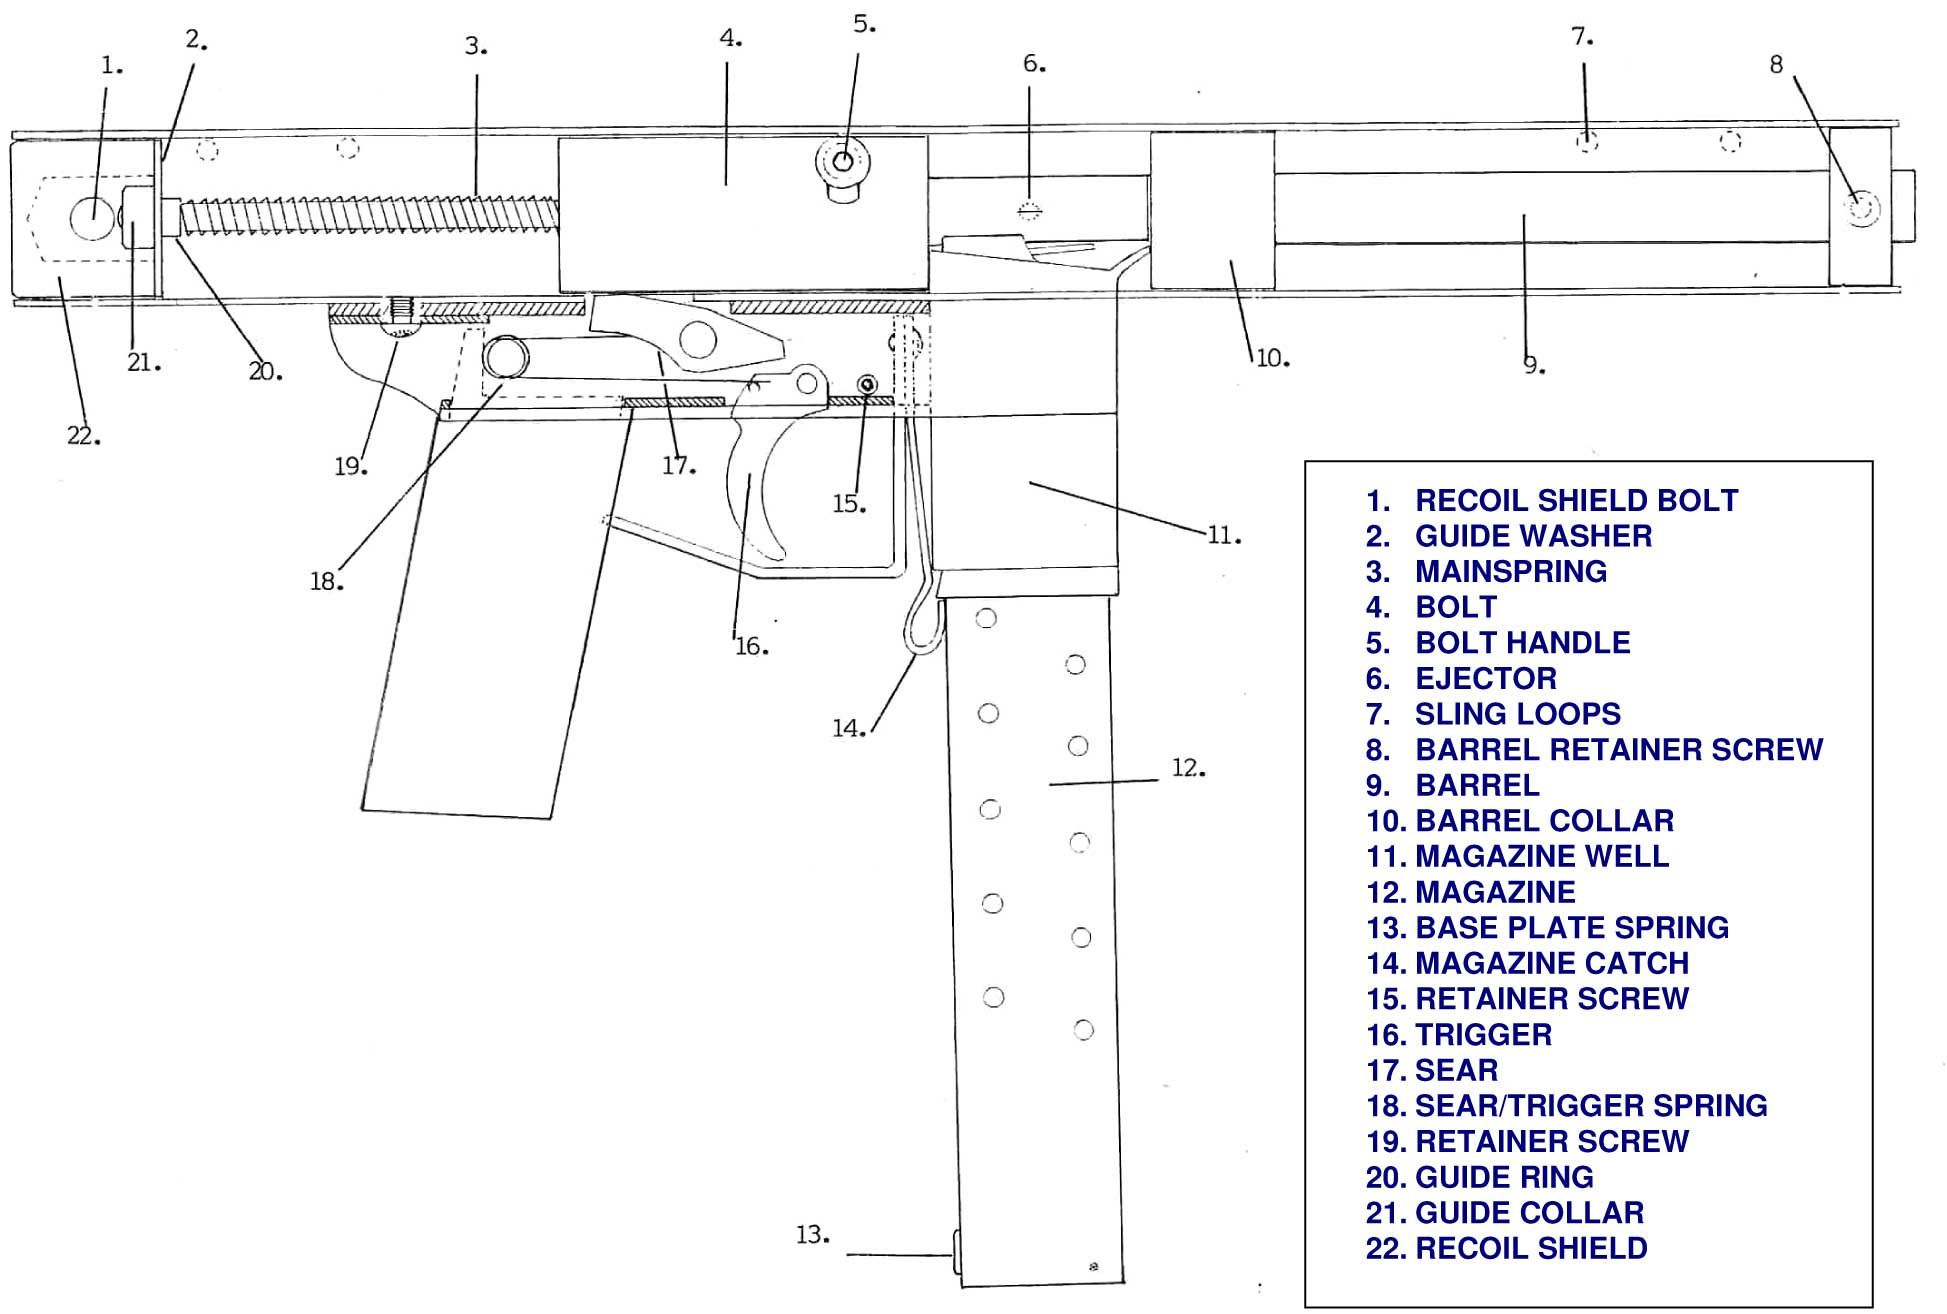 Businesses That Prohibit Guns or Have No Gun Policies